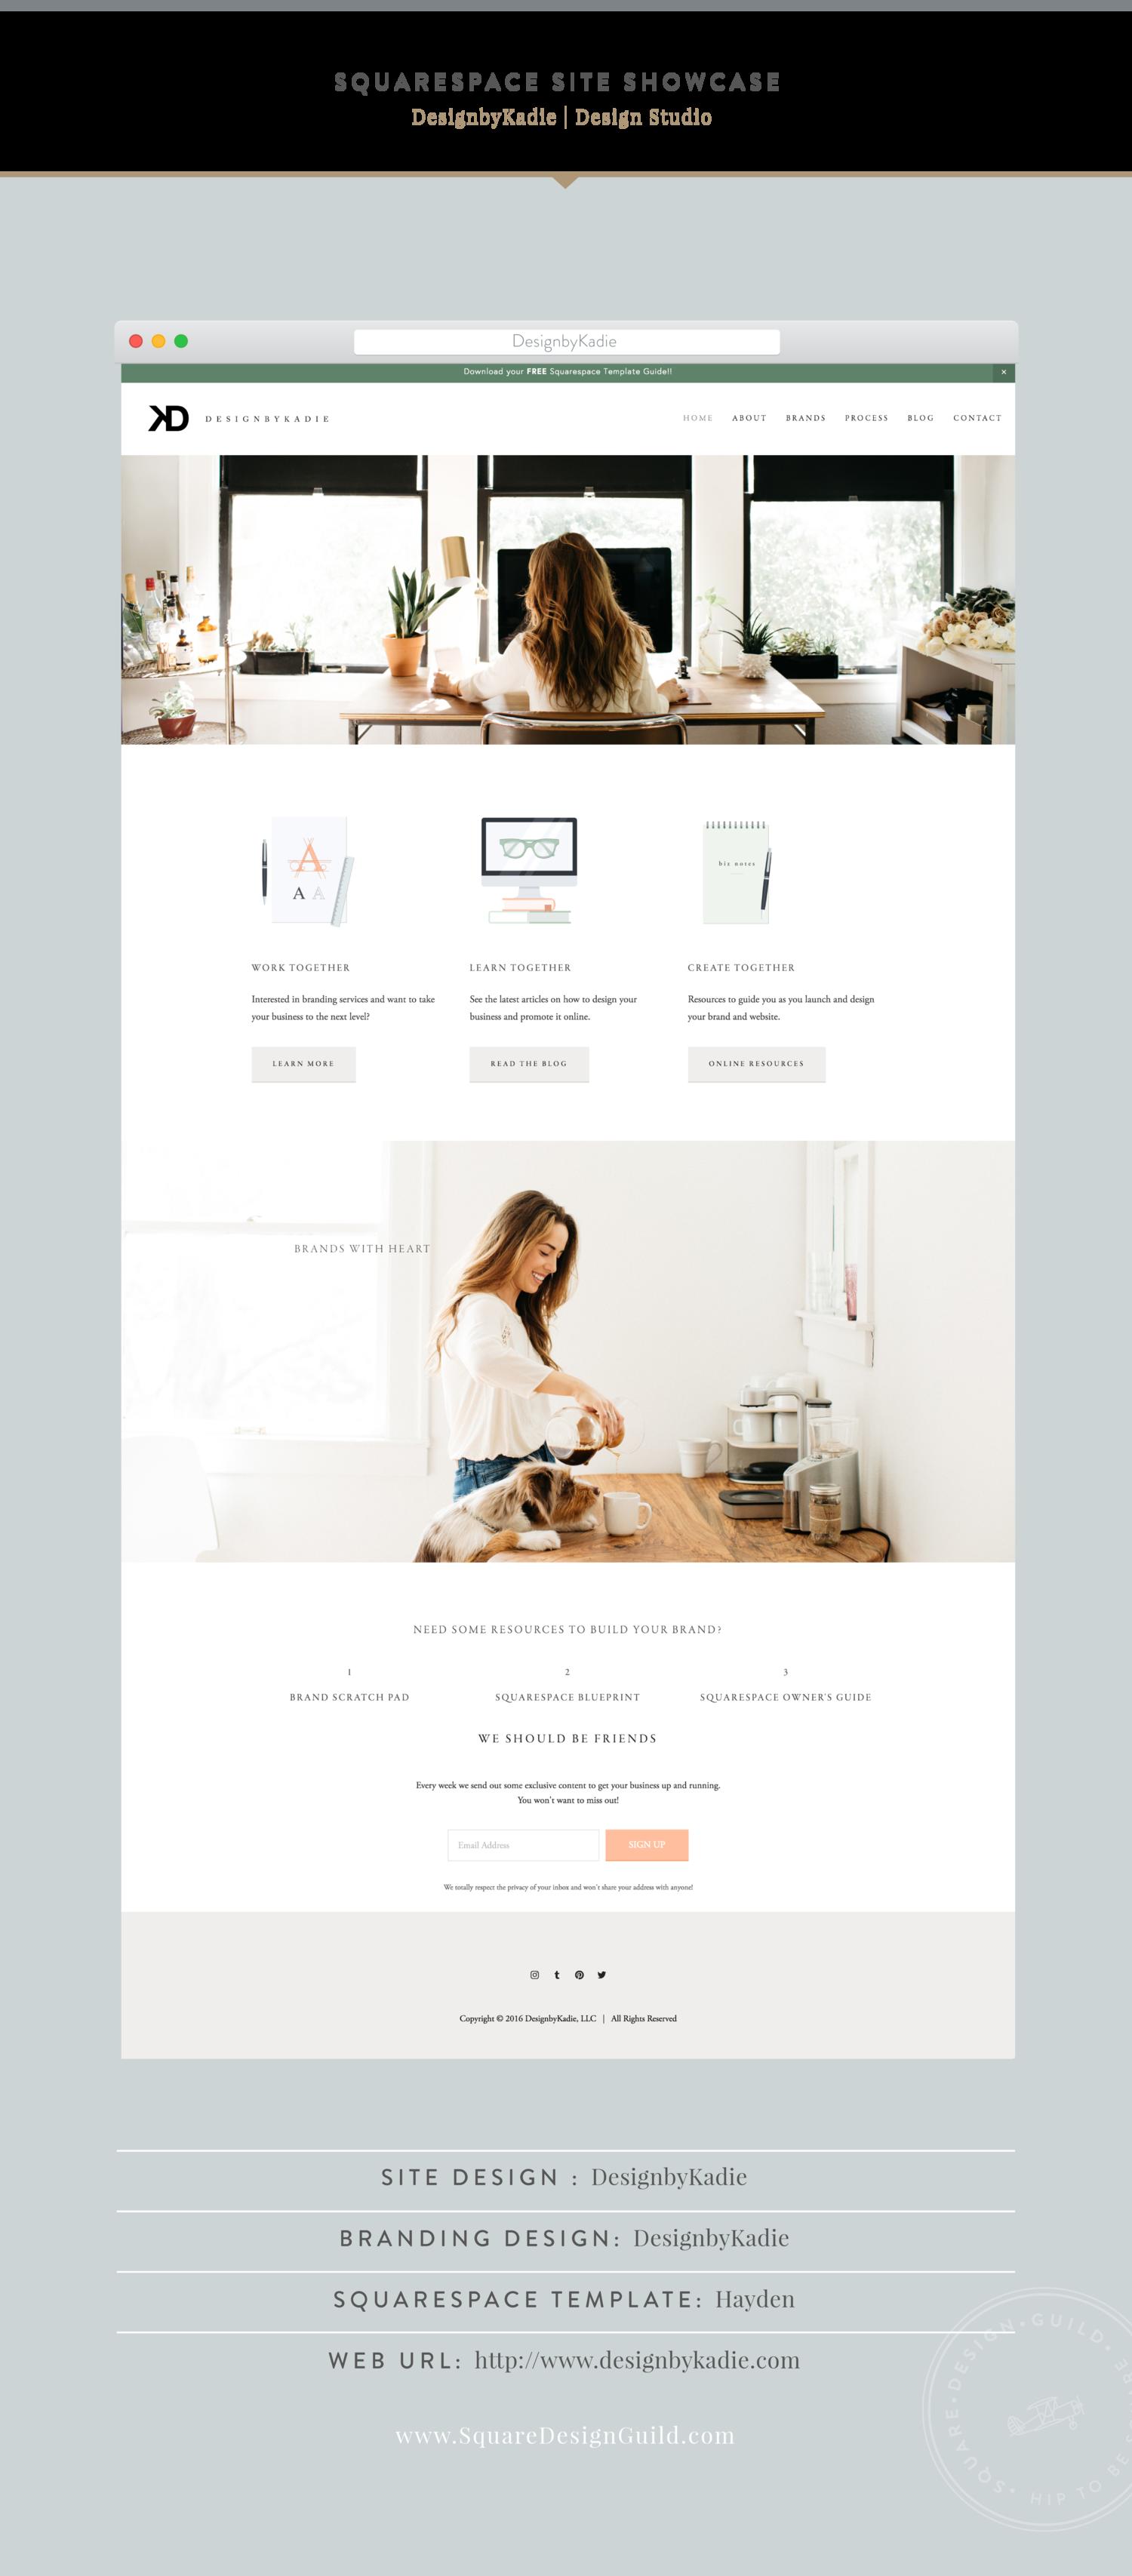 site showcase designbykadie site design and typography rh pinterest com